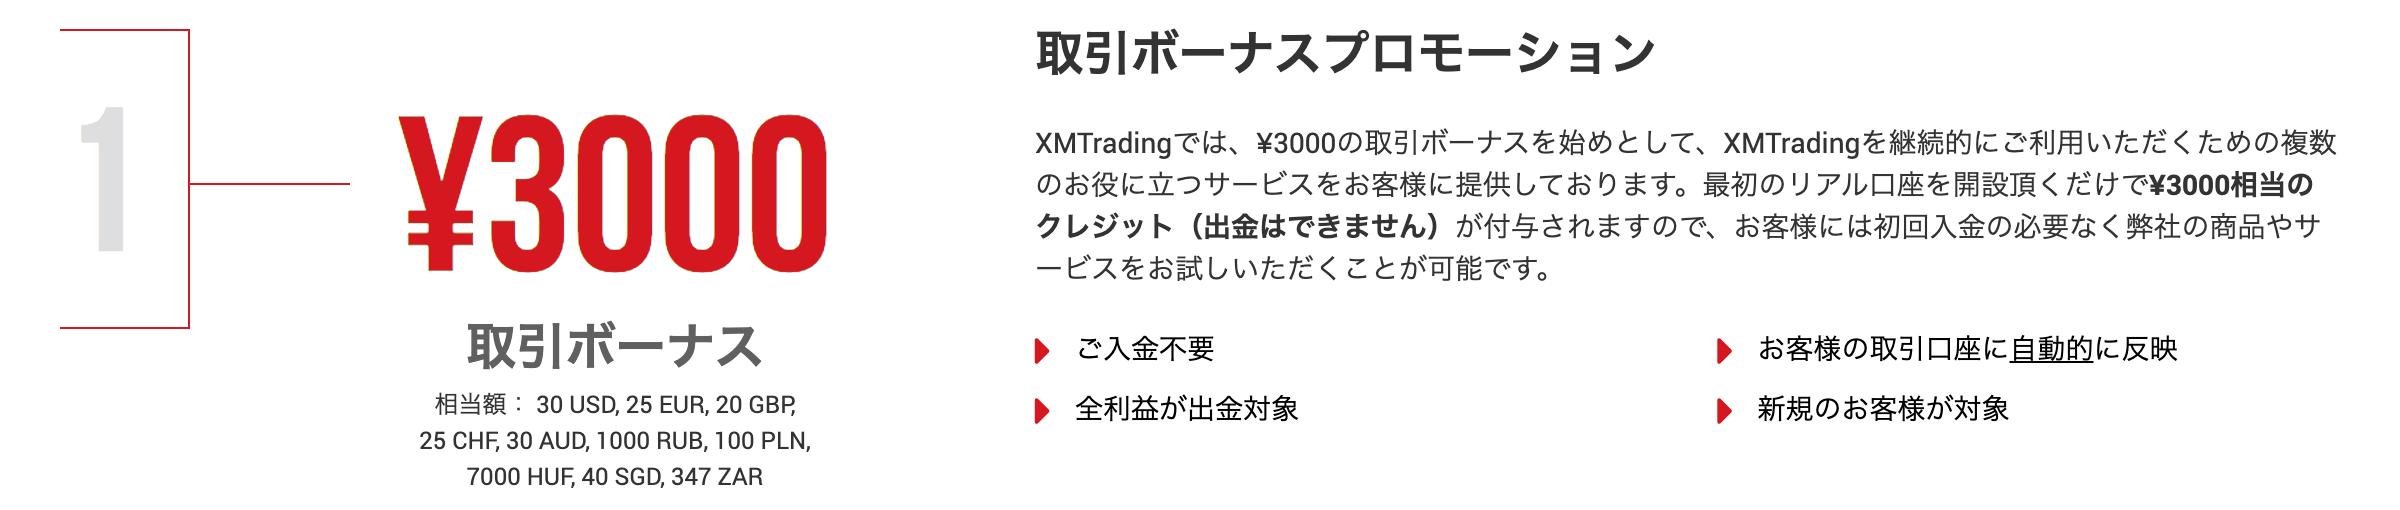 XM口座開設ボーナス(3,000円)